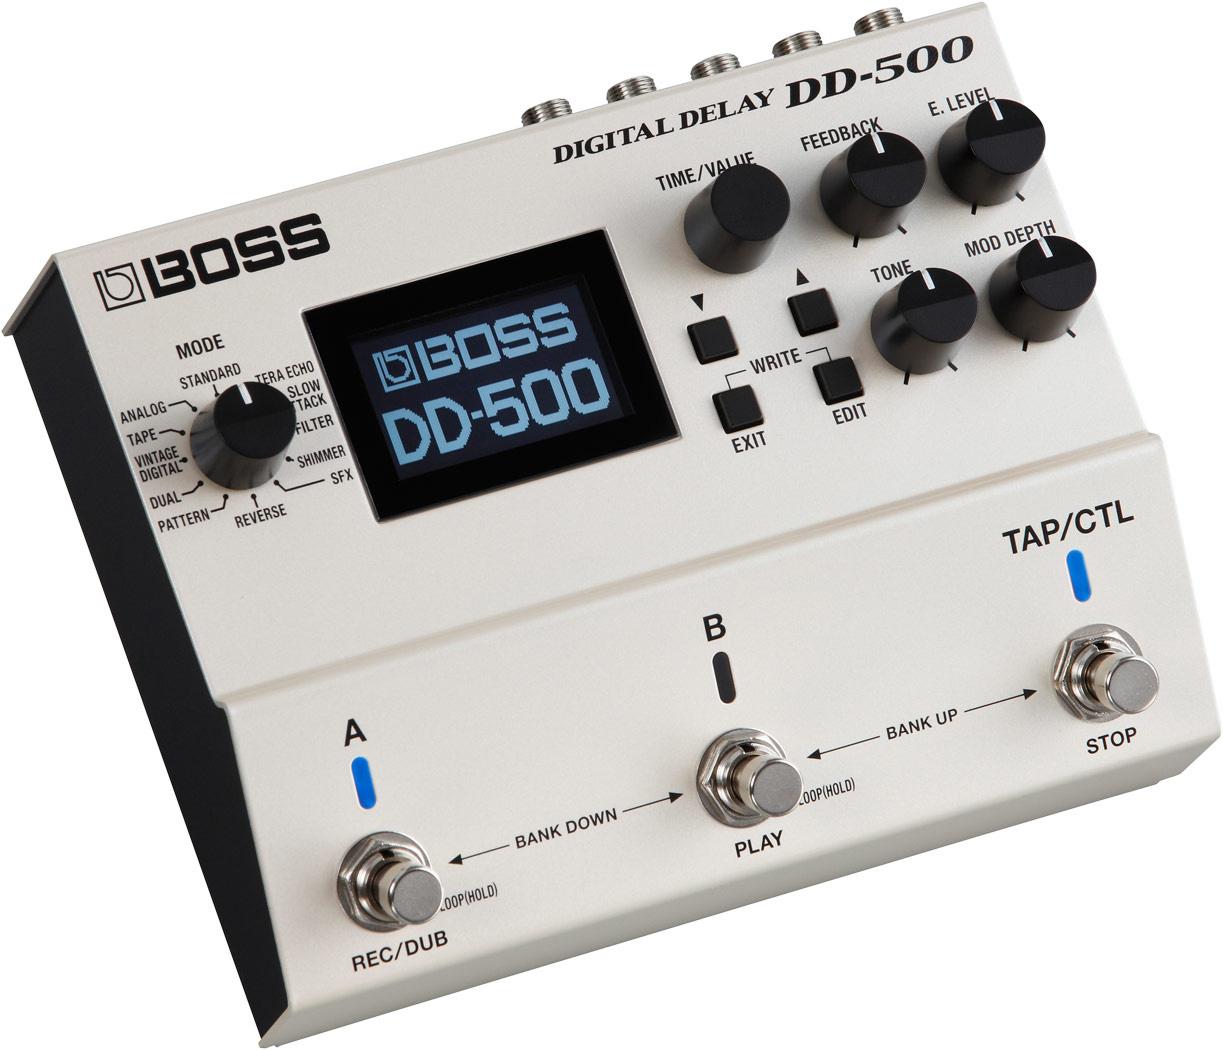 BOSS DD-500 35%OFF Digital デジタルディレイ 日本産 ボス Delay